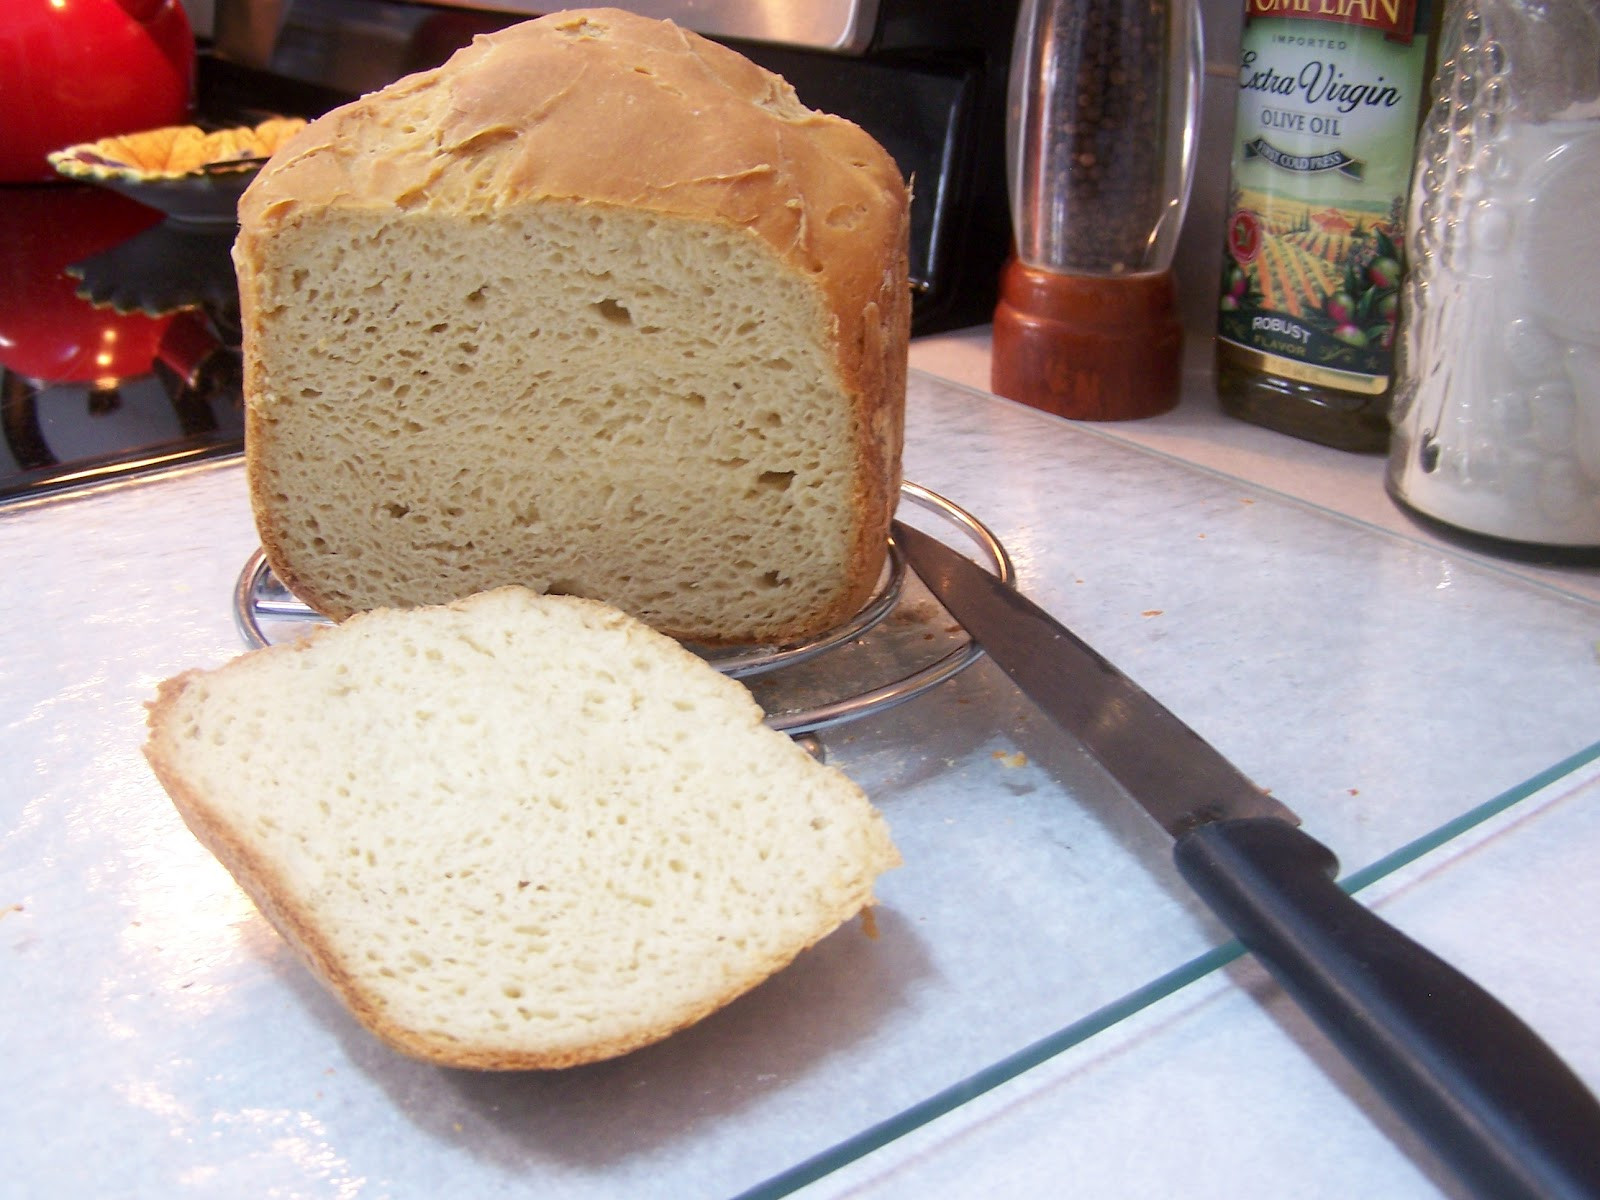 Bread Machine Bread Recipe  Spectacular Gluten Free Bread in the Bread Machine